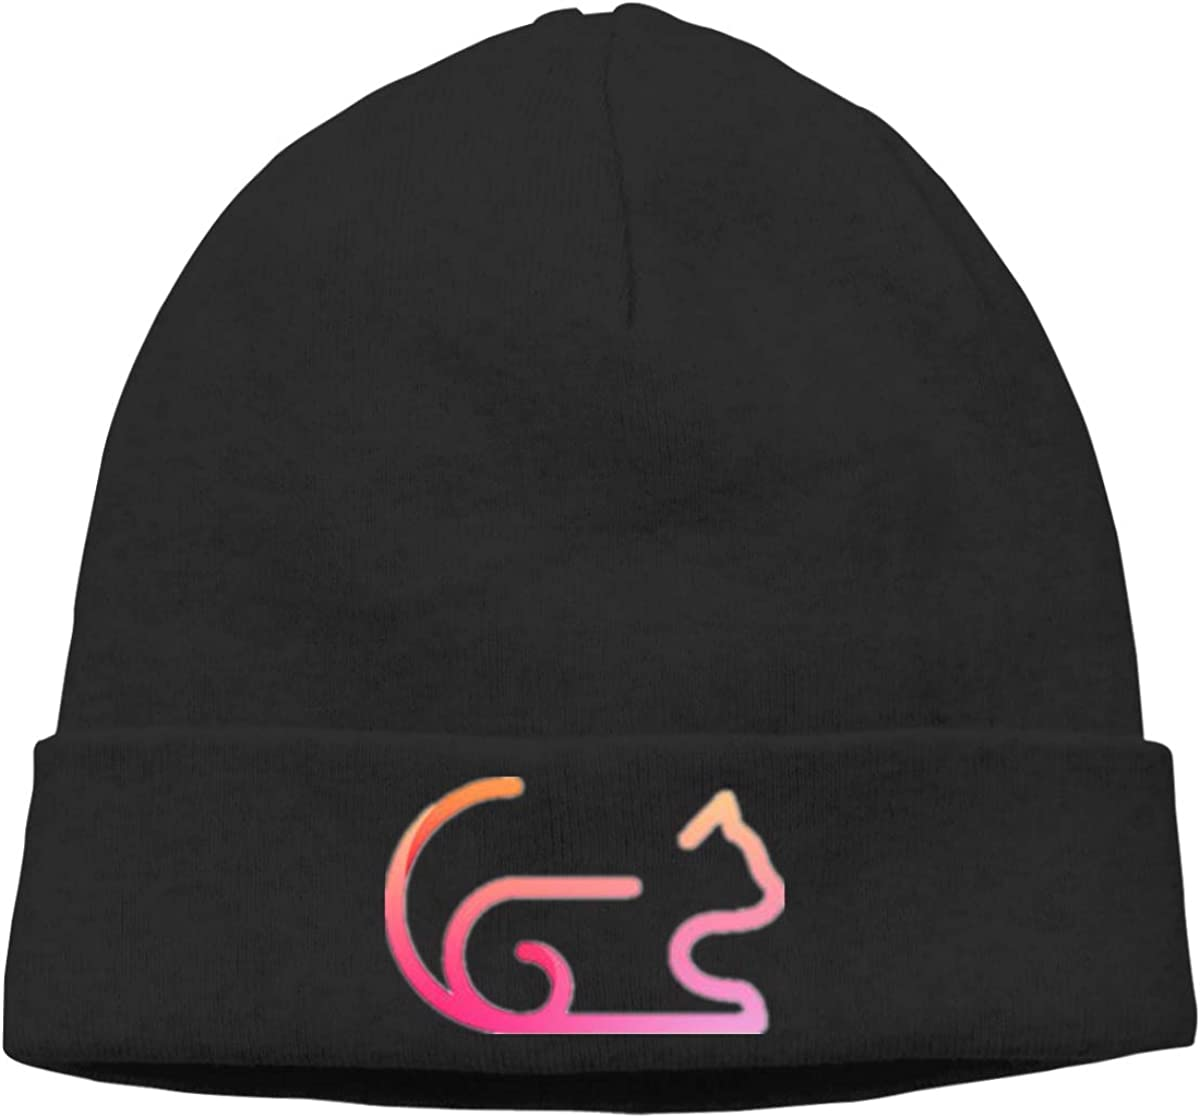 Pink Cat Cap Unisex Cuffed Warm Beanie Hats Ski Slouchy Hat